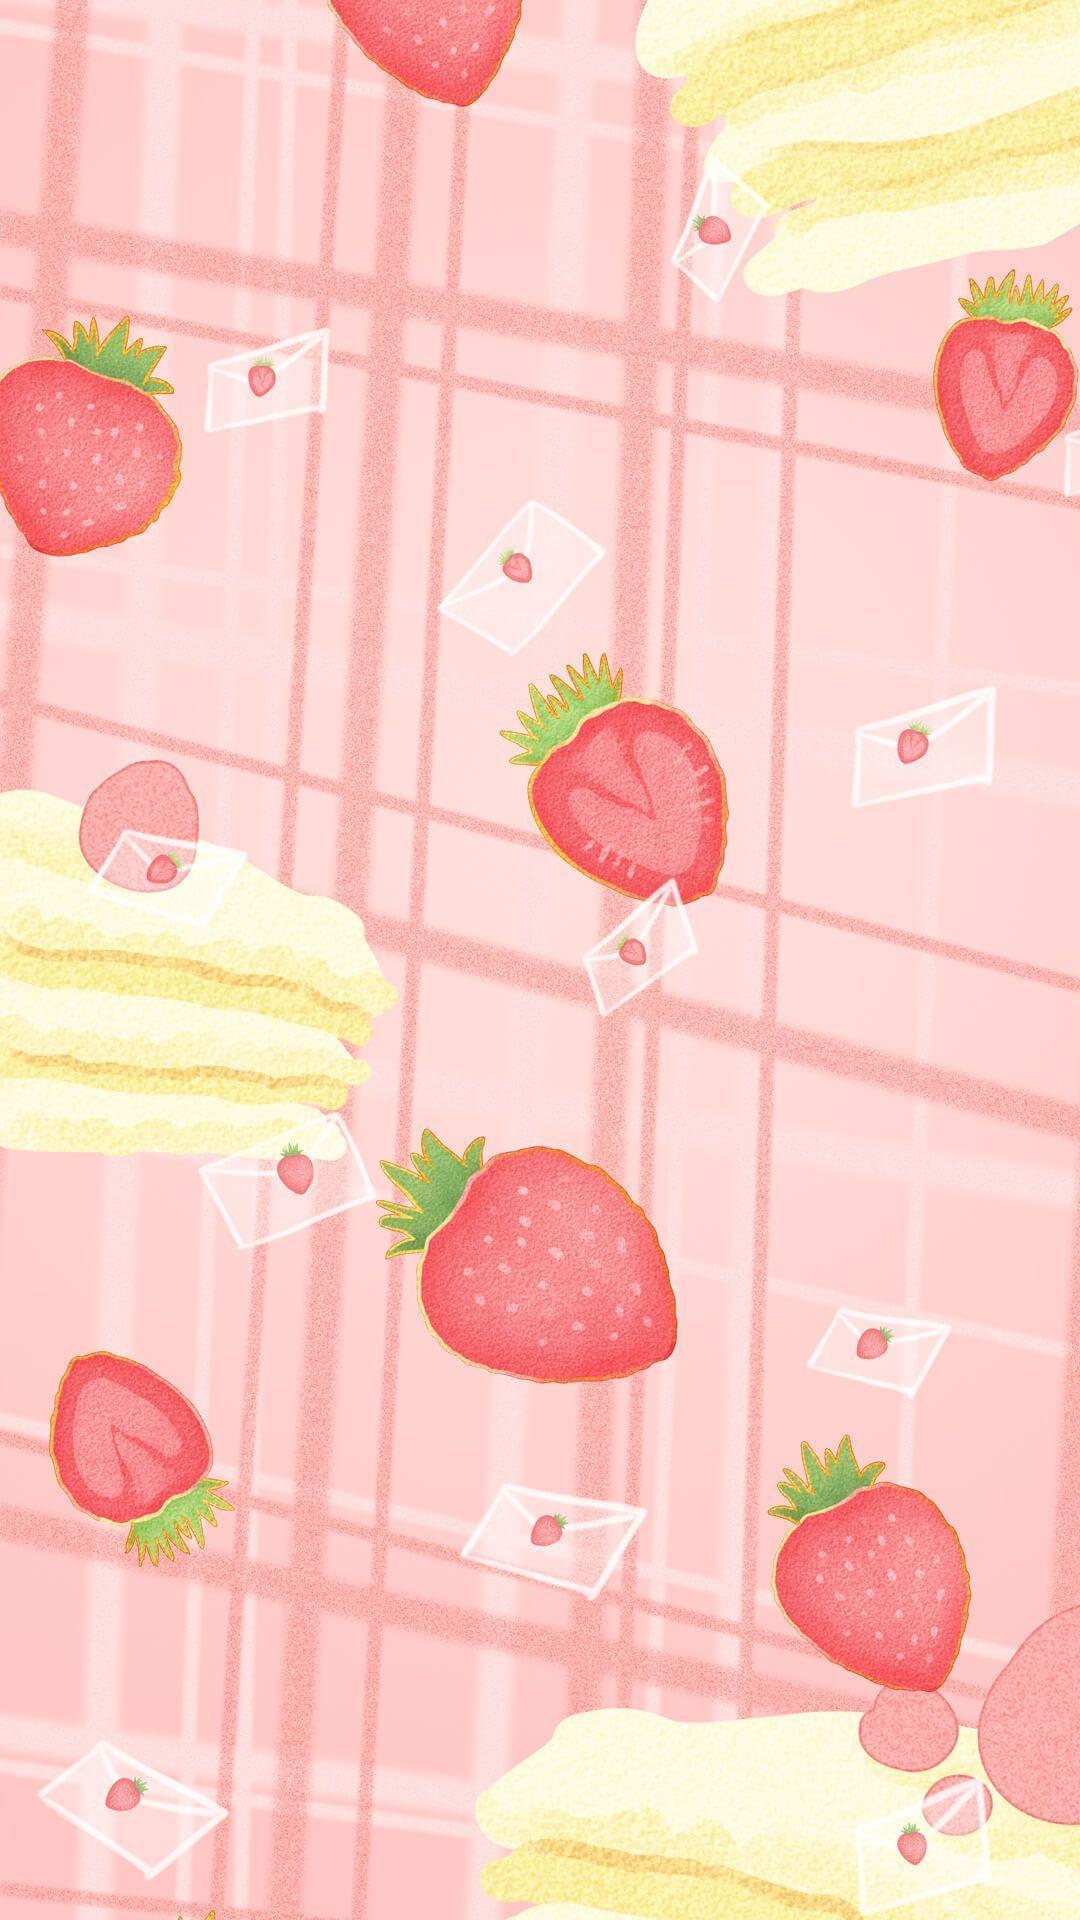 Strawberry Wallpaper Wallpaper Iphone Cute Soft Wallpaper Iphone Background Wallpaper